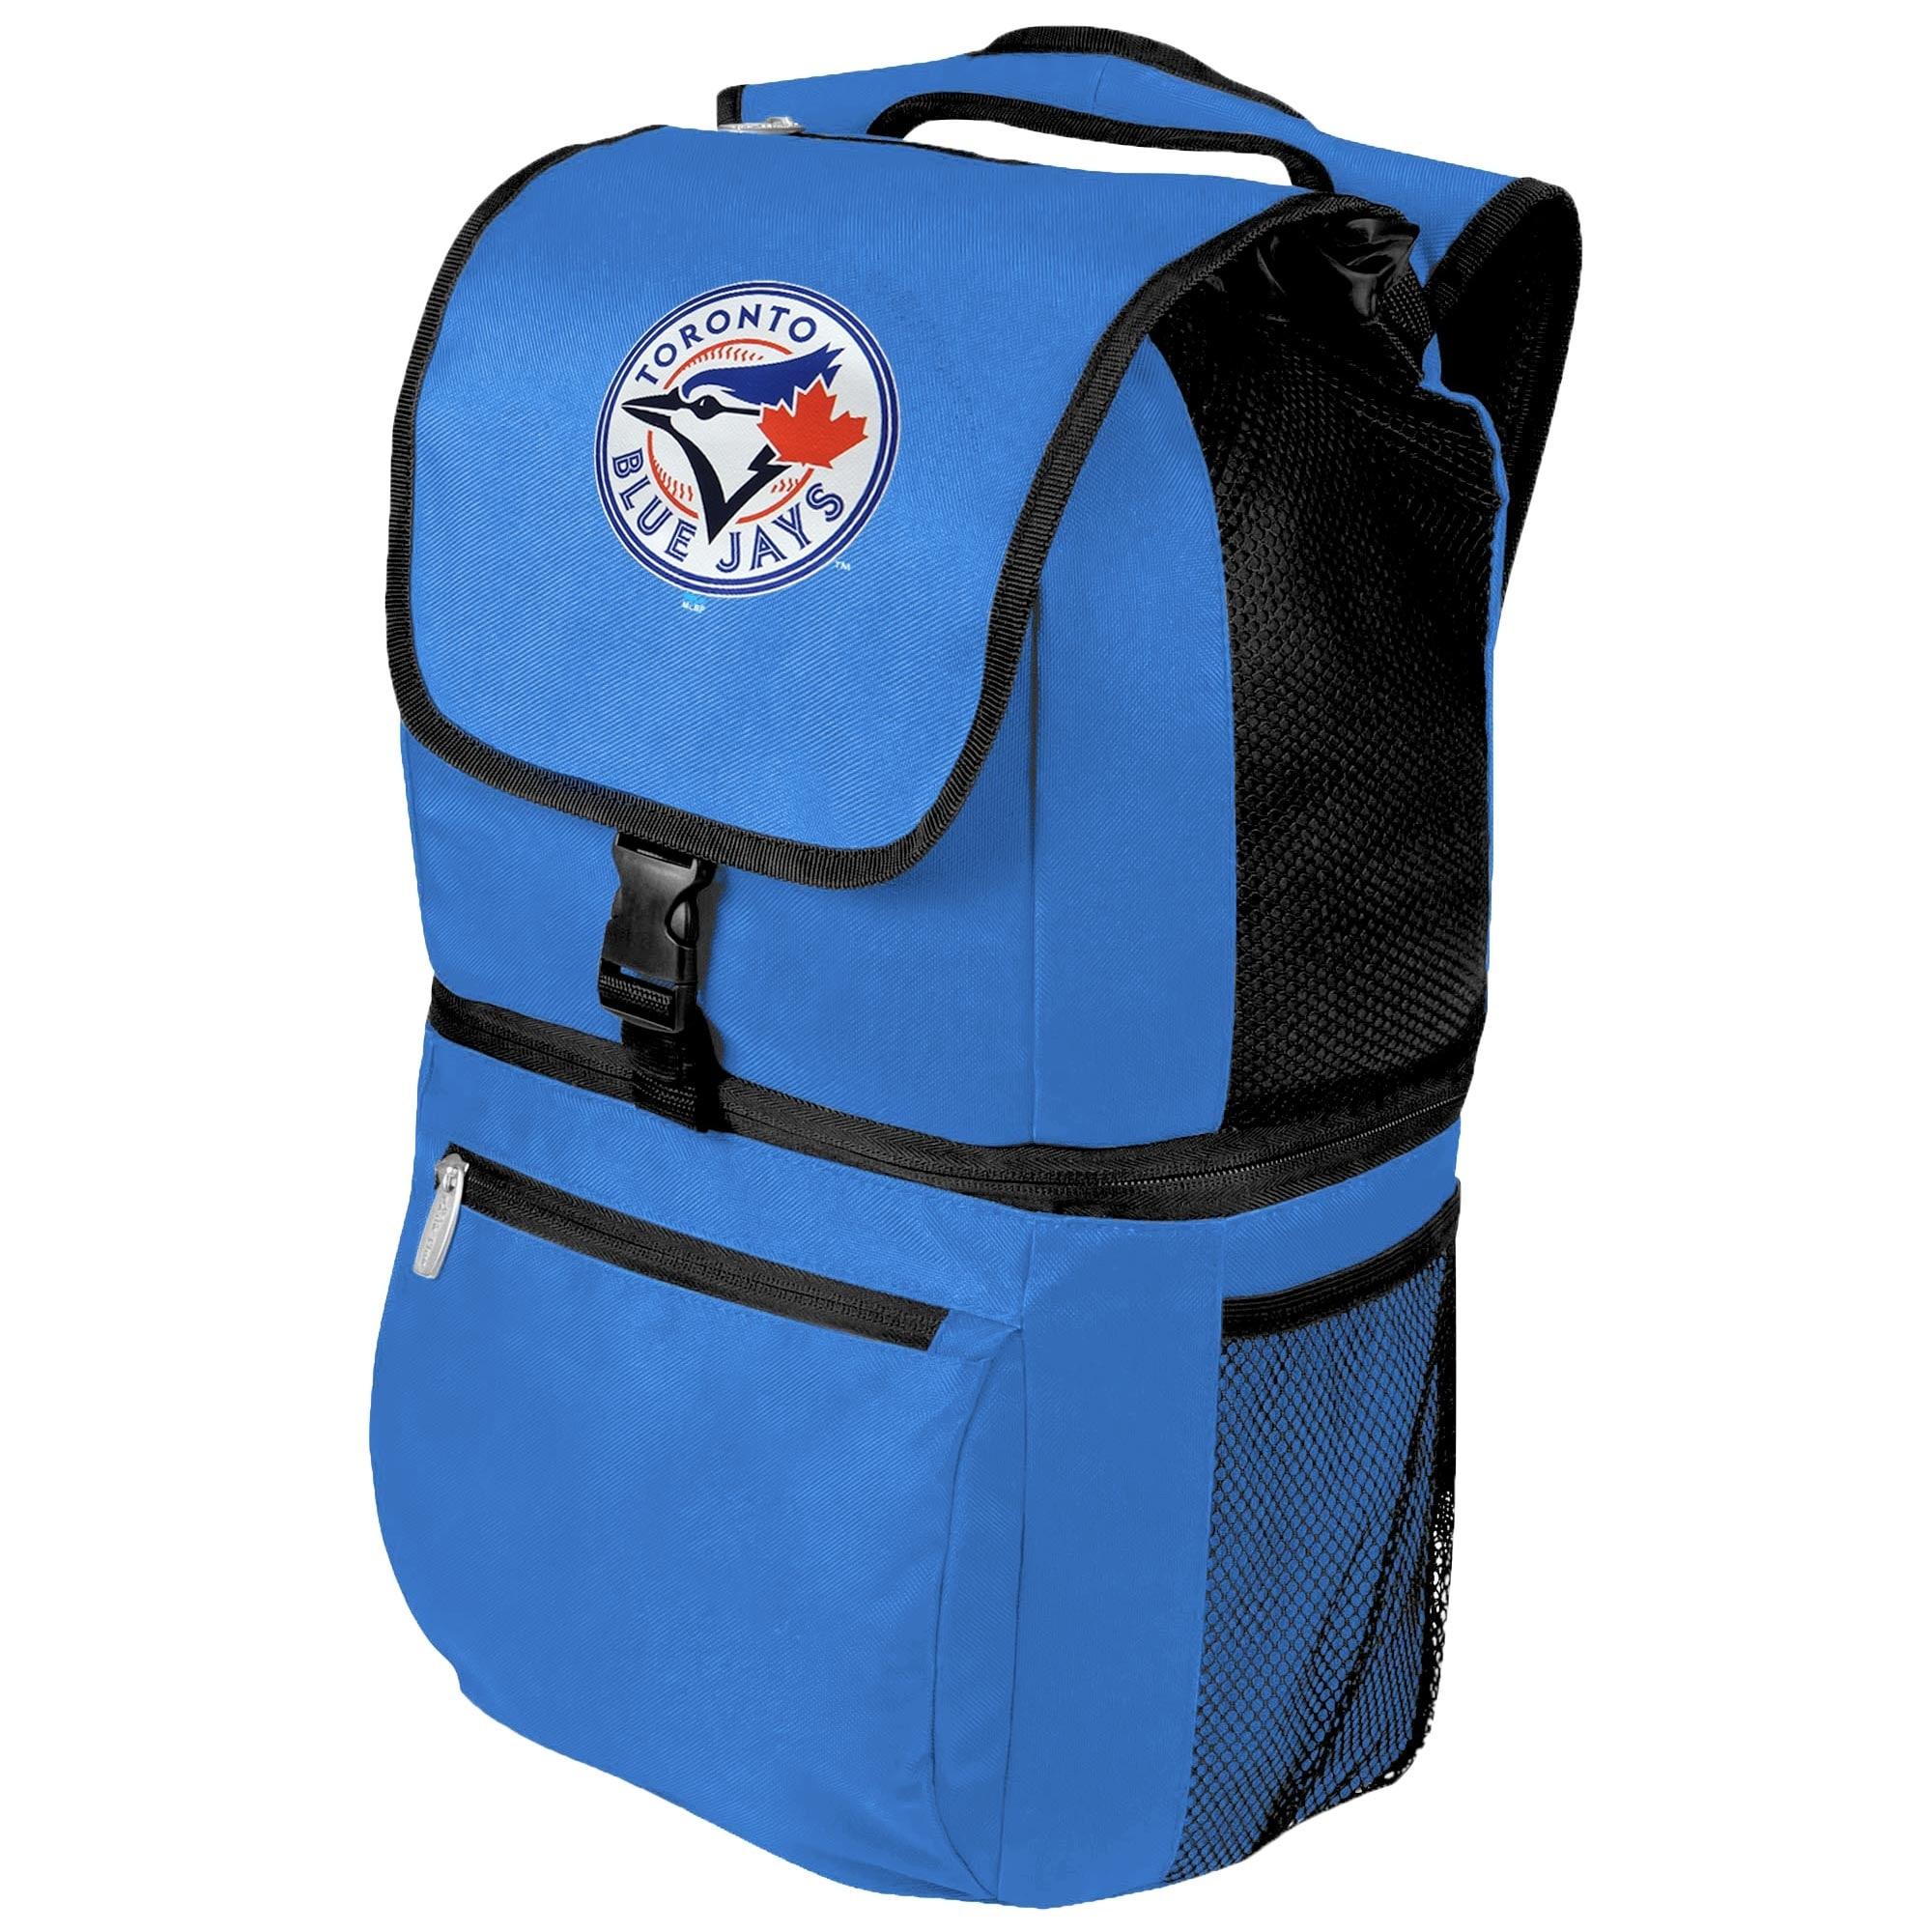 Toronto Blue Jays Zuma Backpack Cooler - Royal